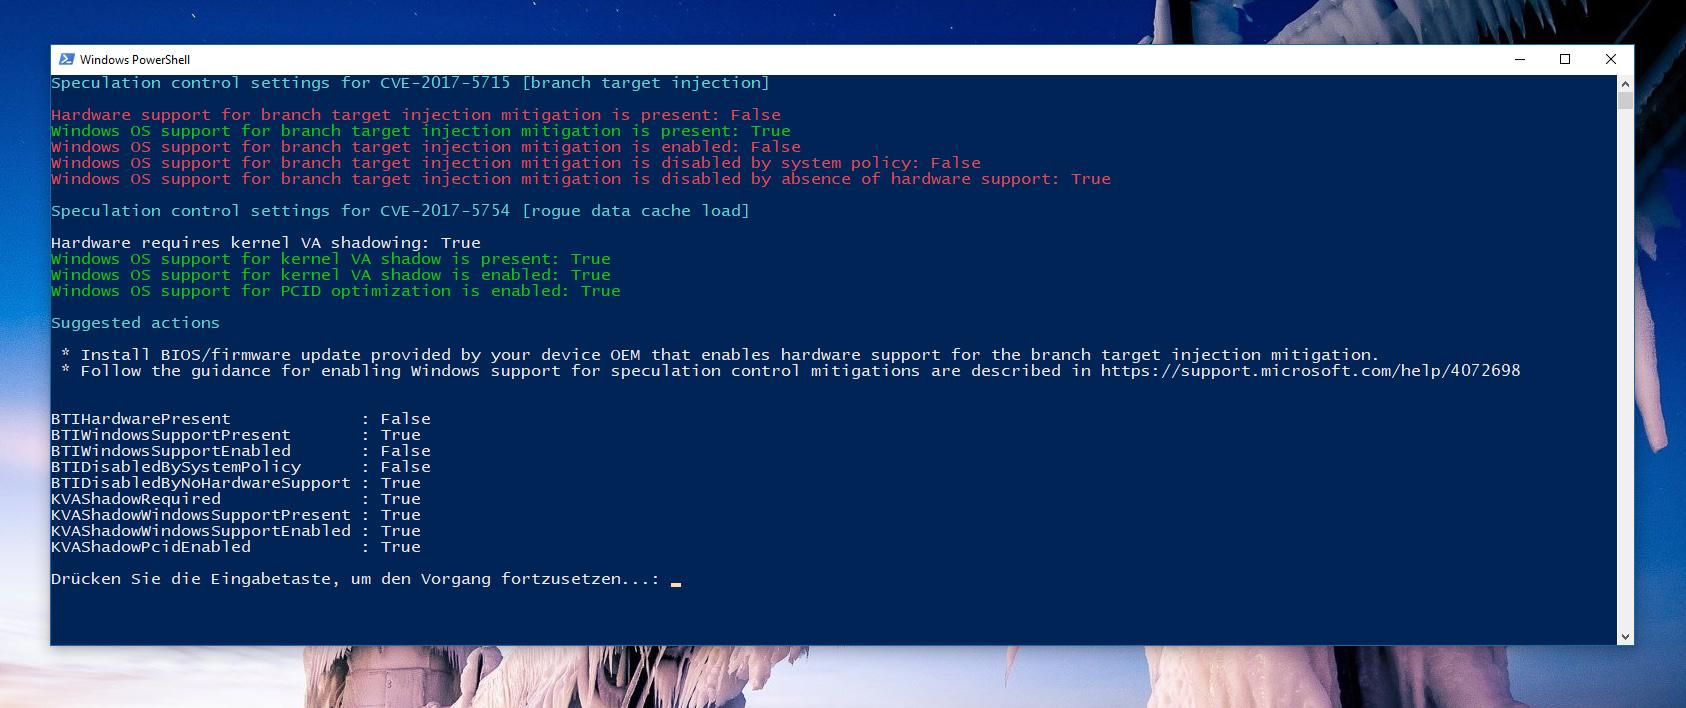 Windows Detection Tool